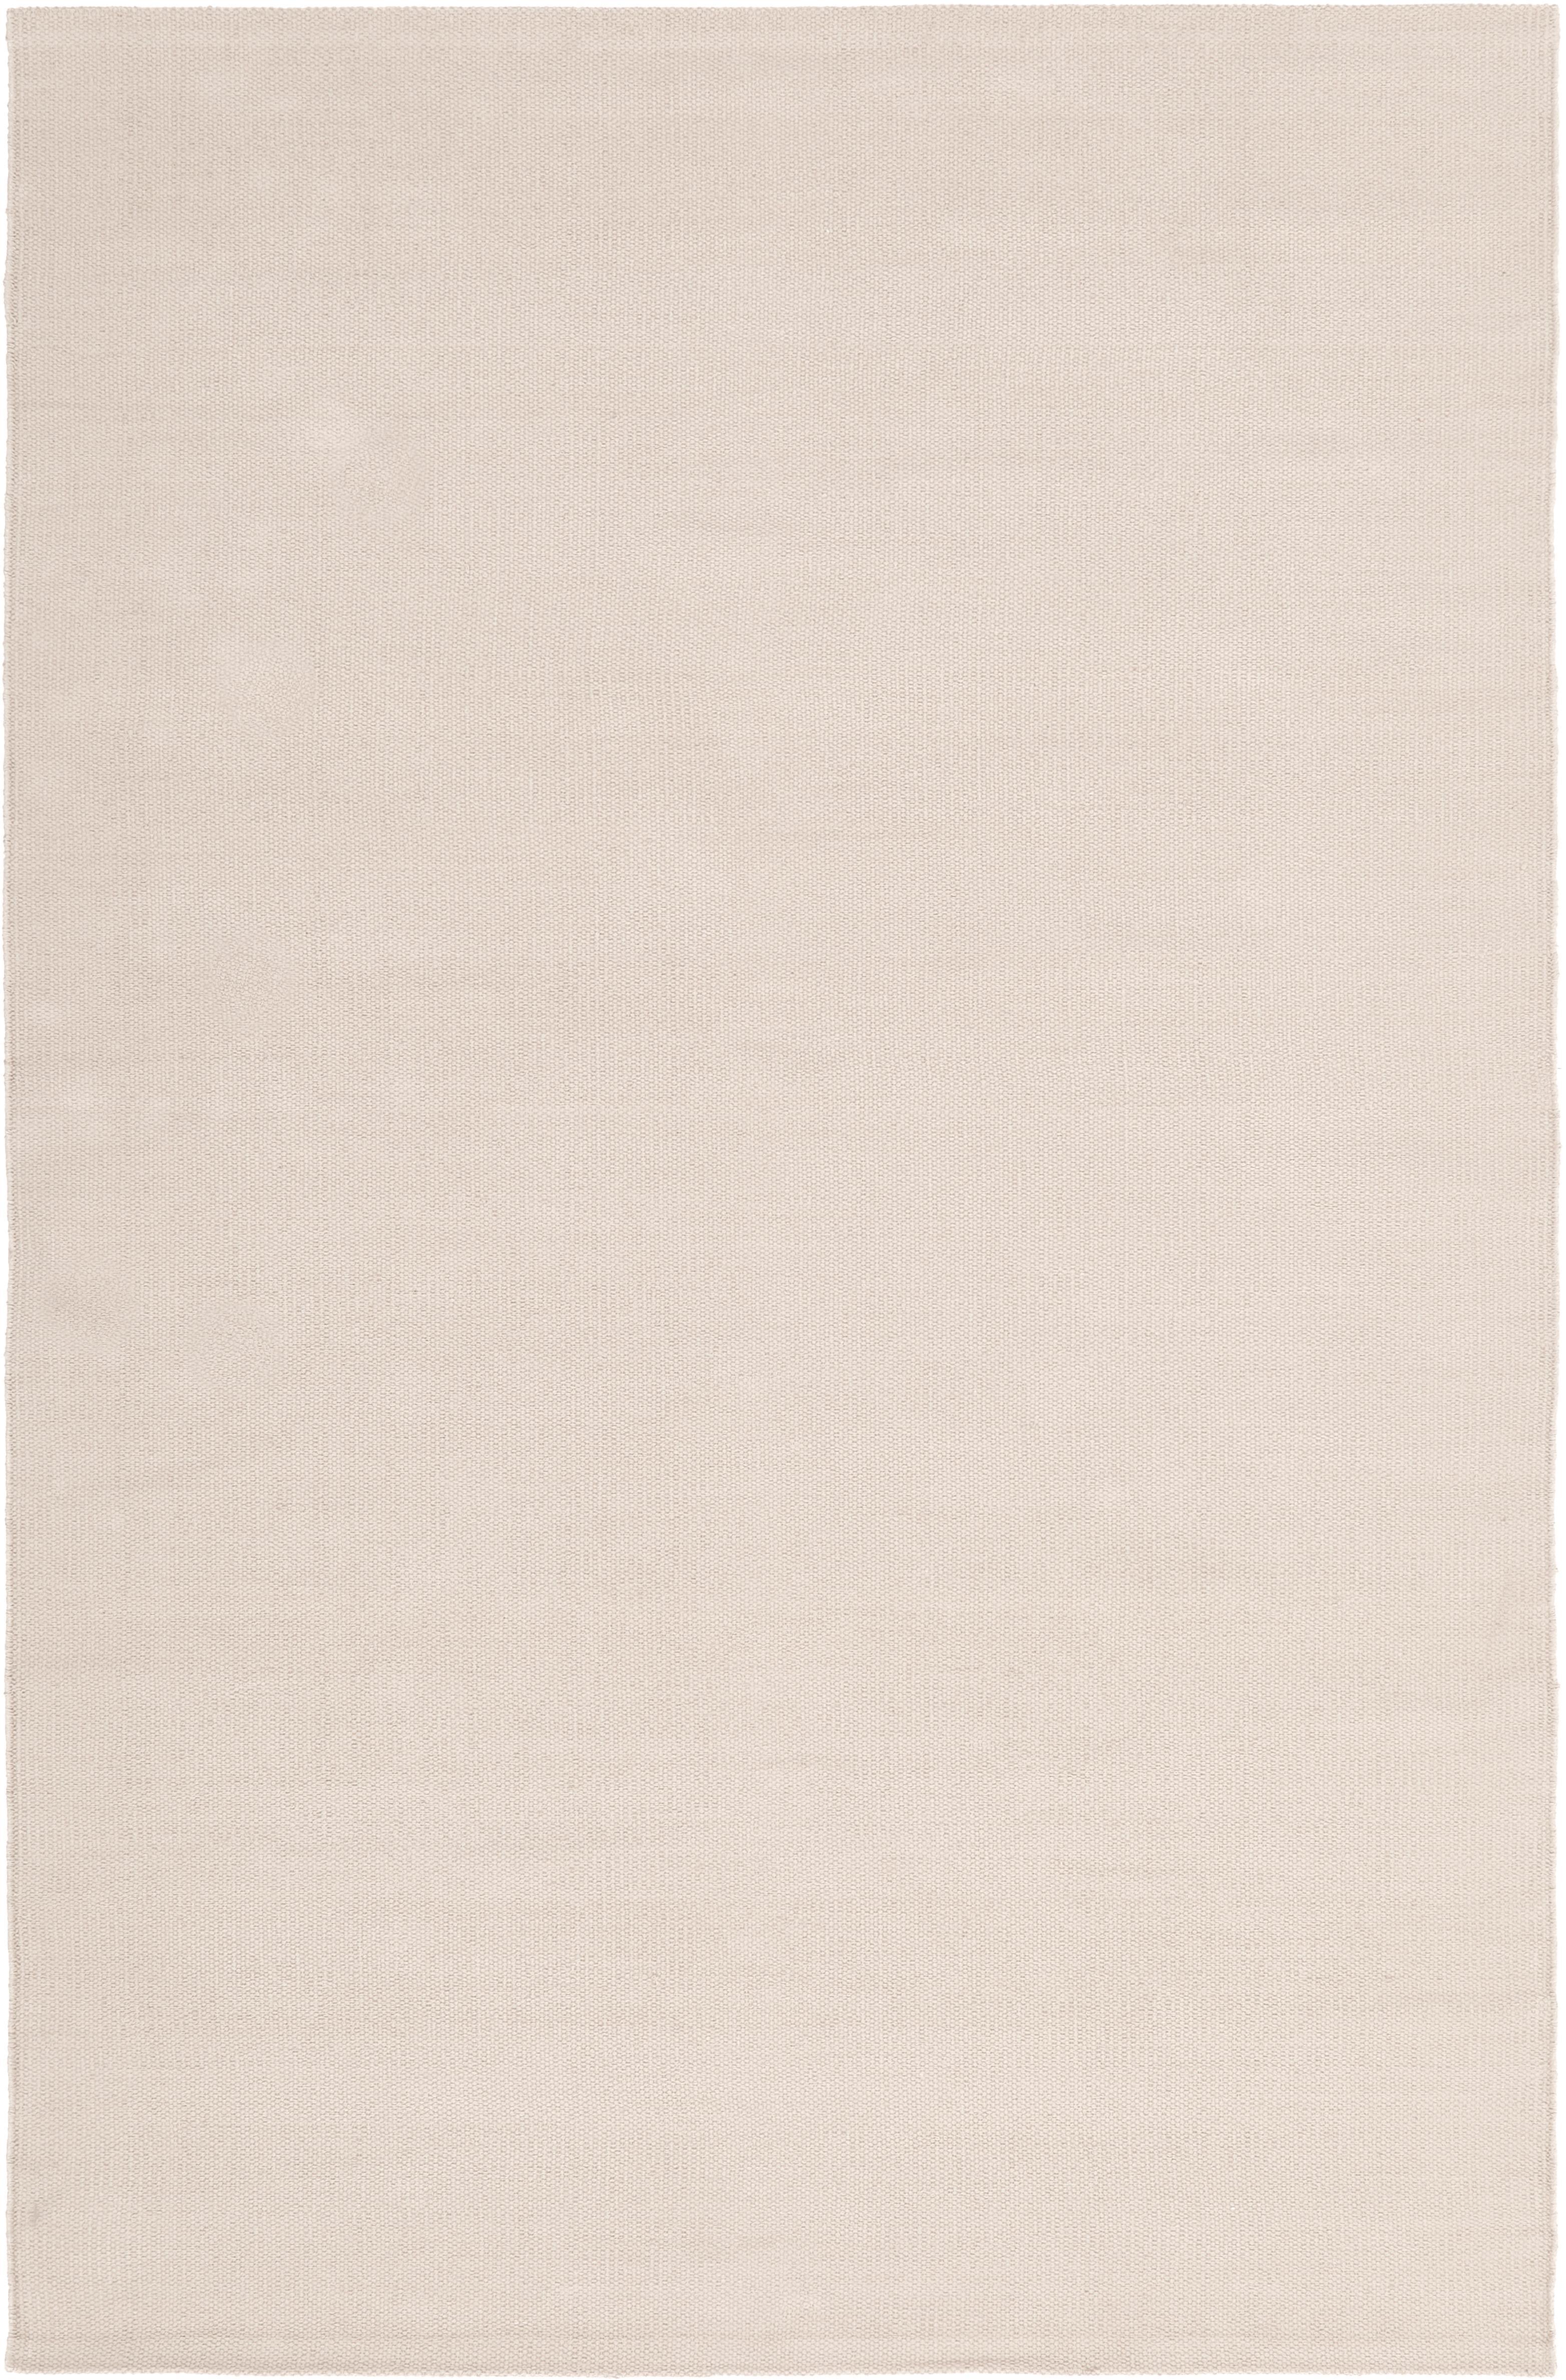 Alfombra artesanal de algodón Agneta, 100%algodón, Gris pardo, An 120 x L 180  cm(Tamaño S)